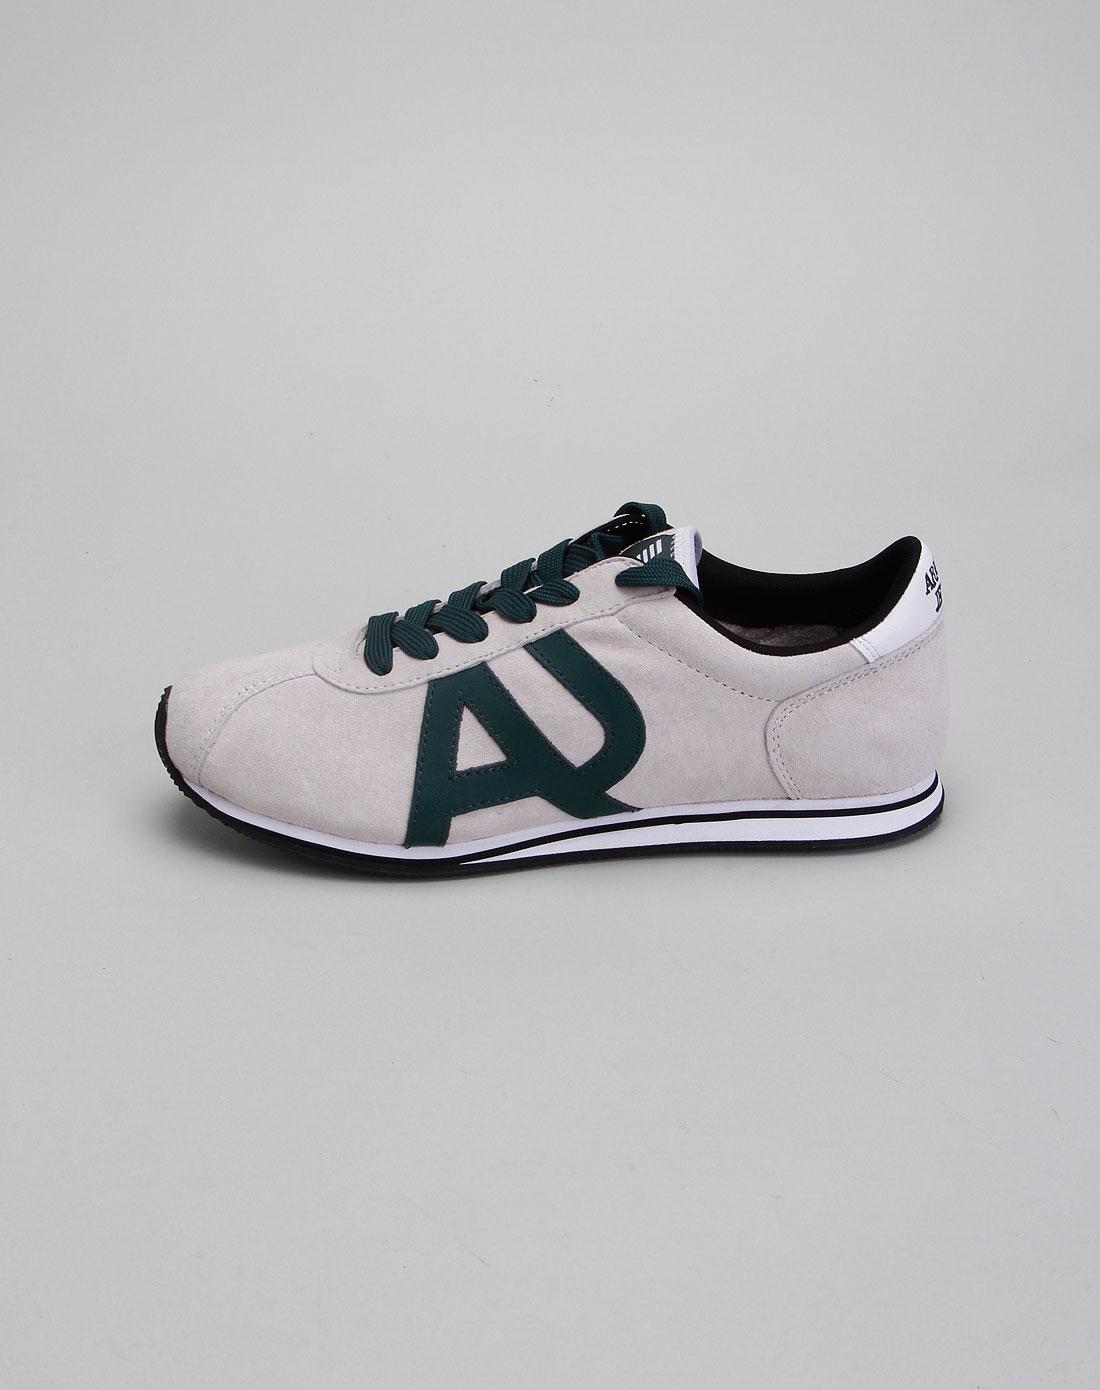 AJ鞋手绘壁纸